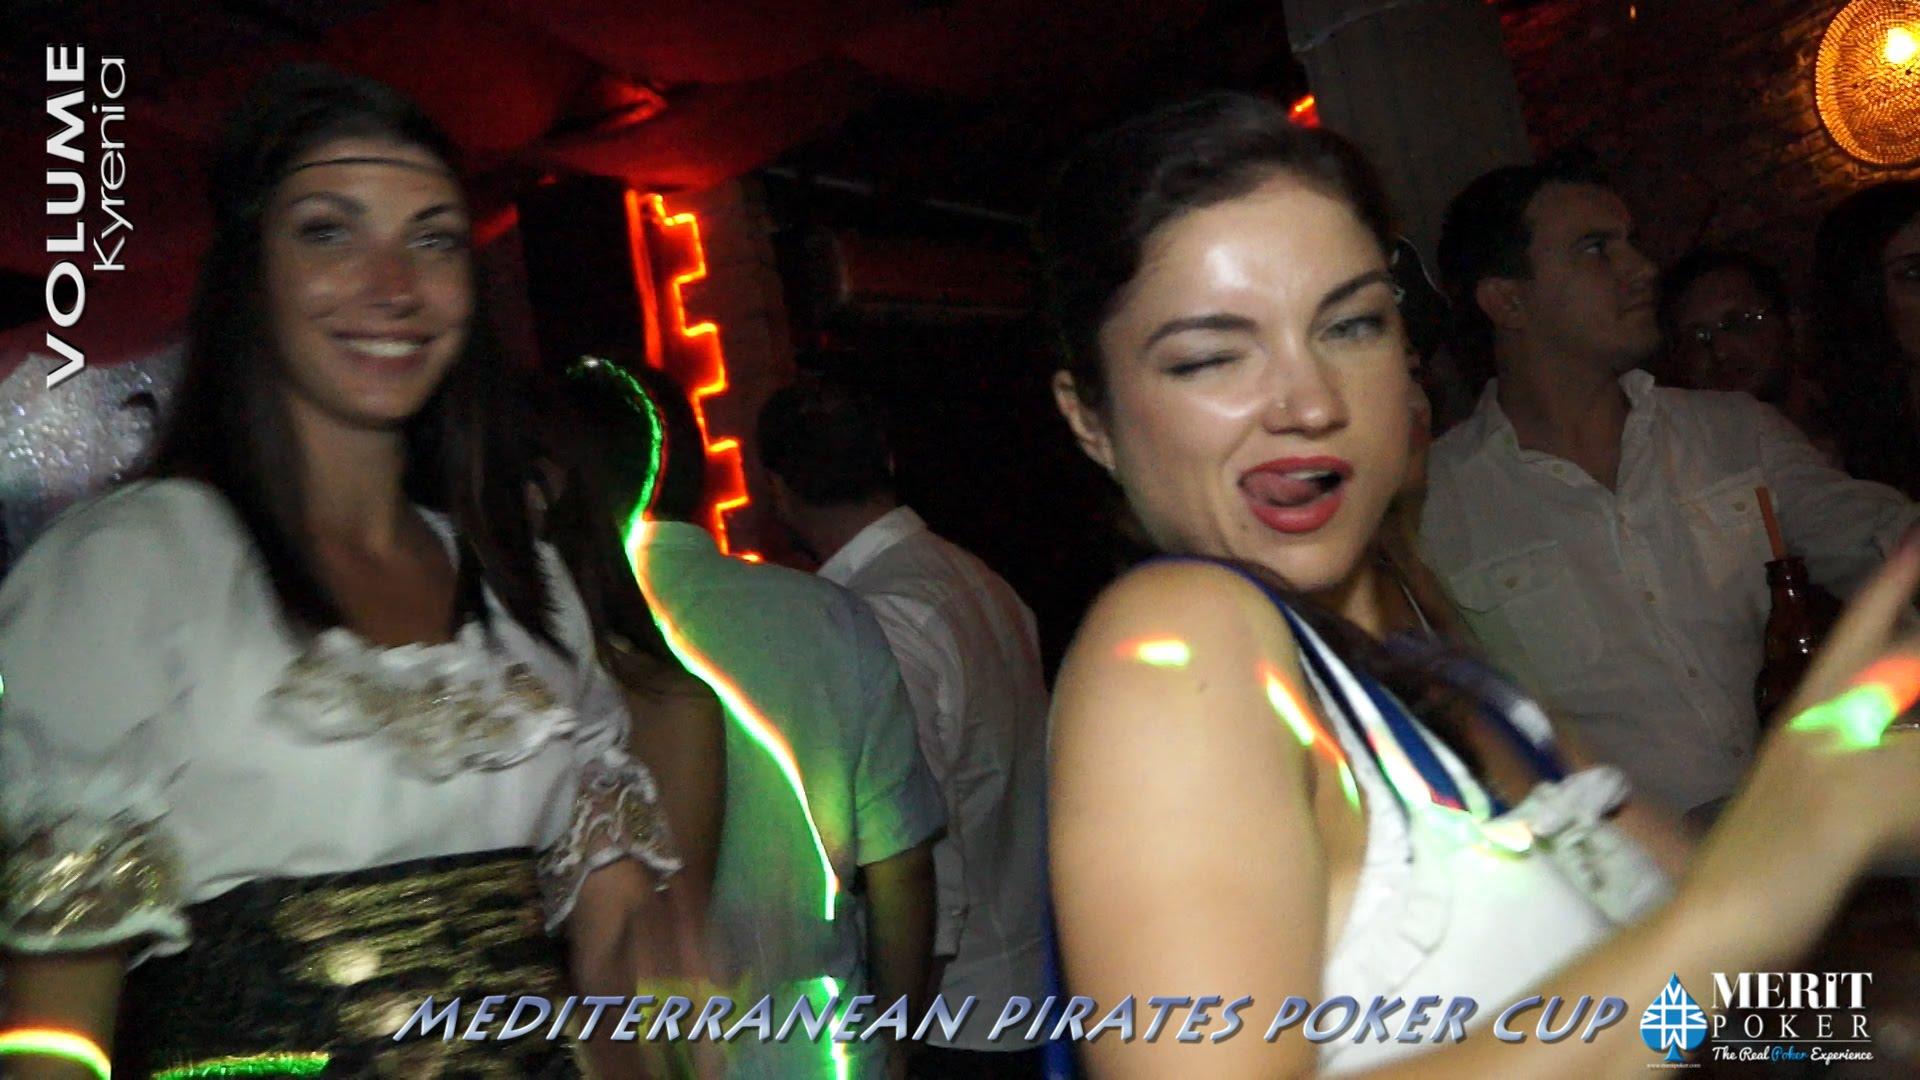 Mediterranean Pirates Poker Cup «VOLUME NIGHT»